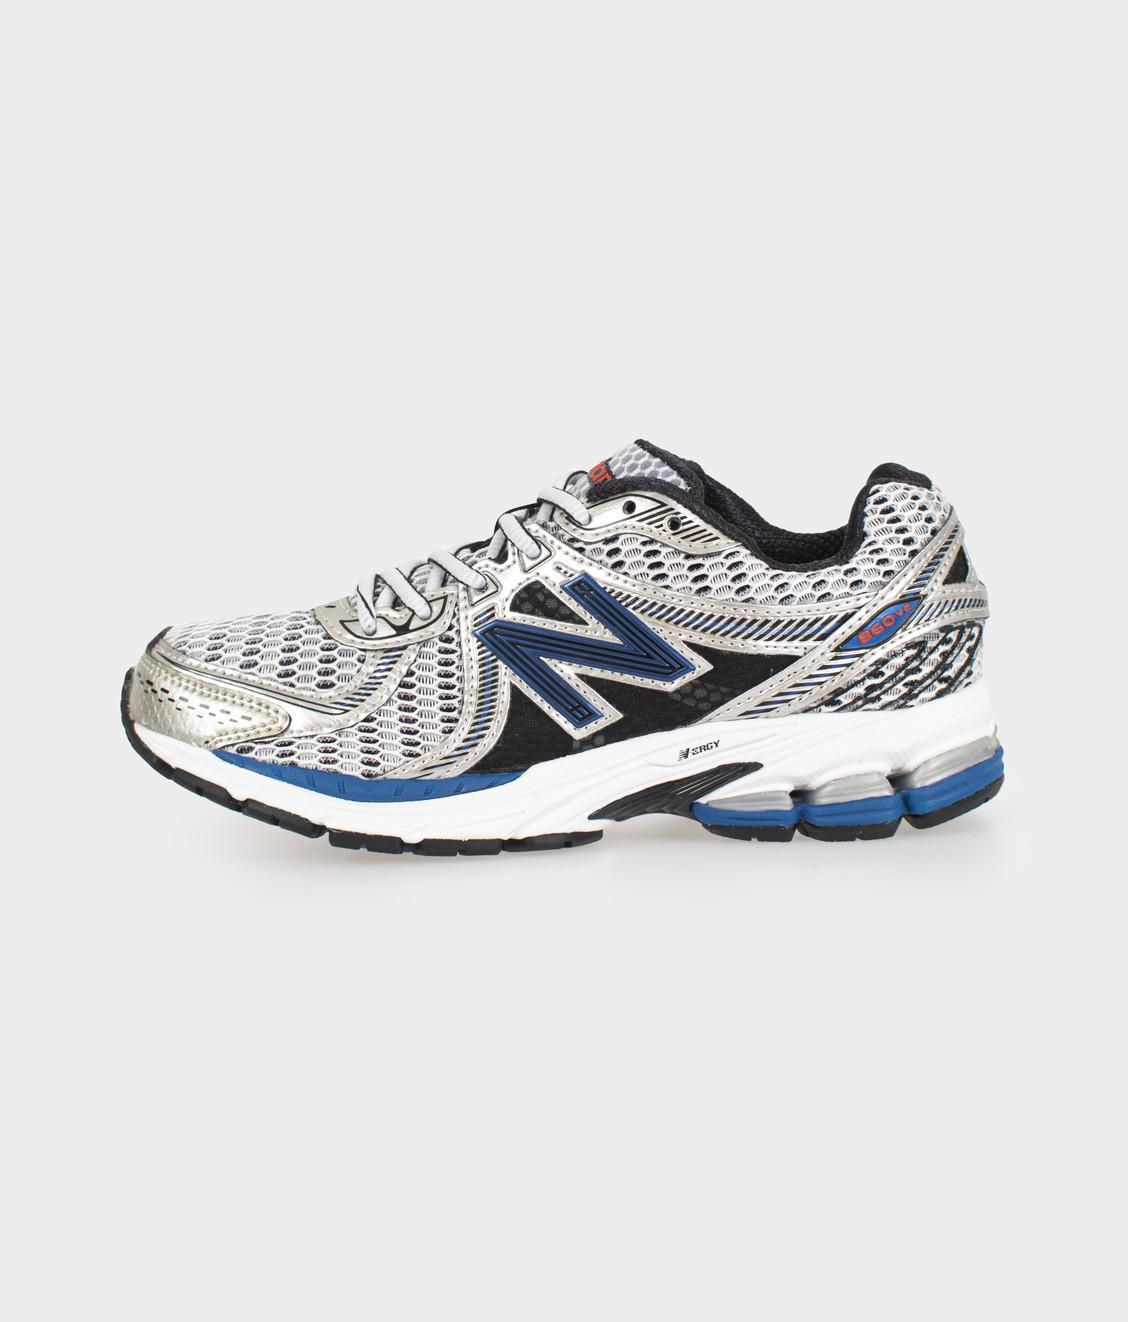 New Balance W 860 Silver Blue